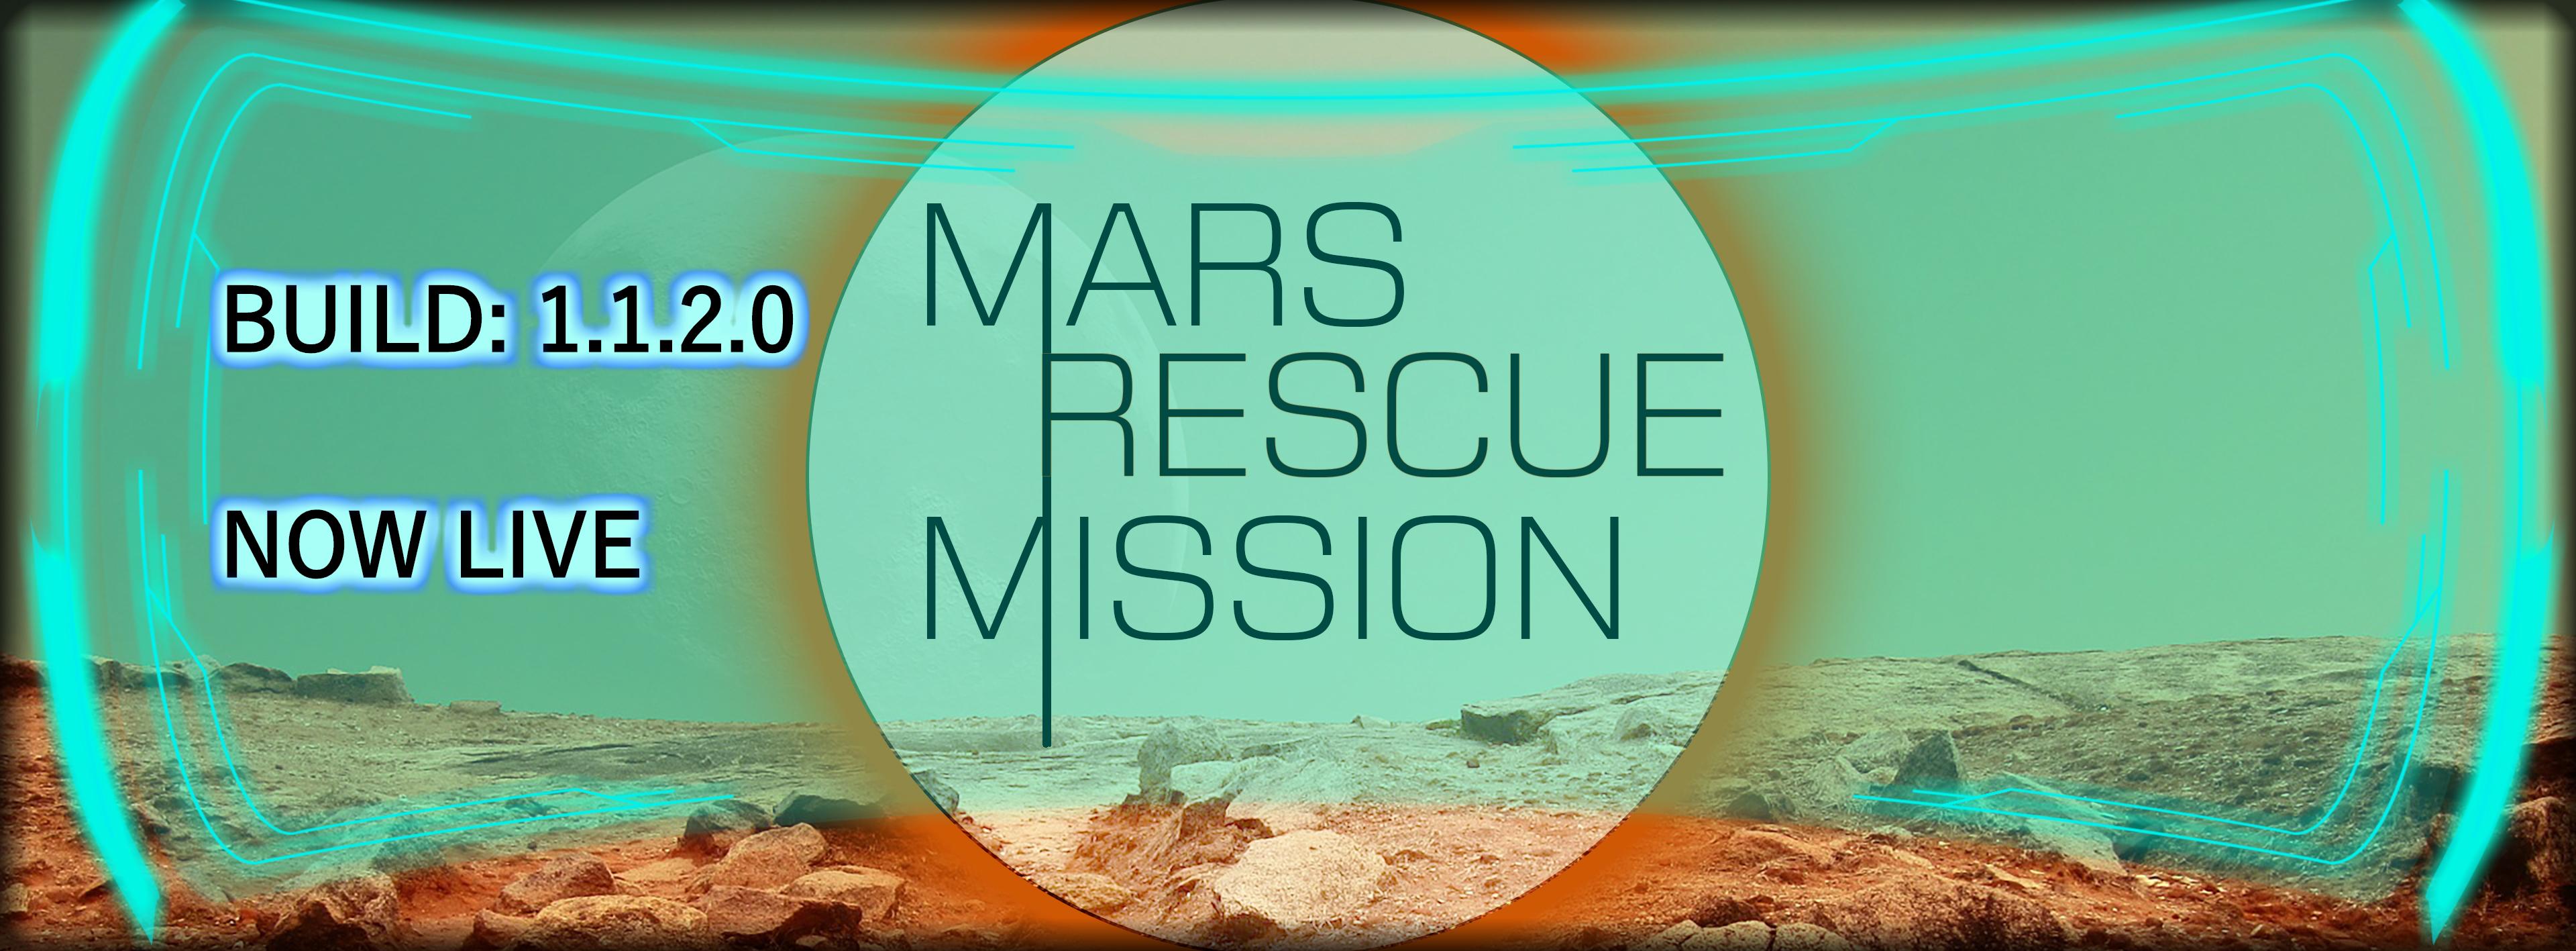 Mars Rescue Mission